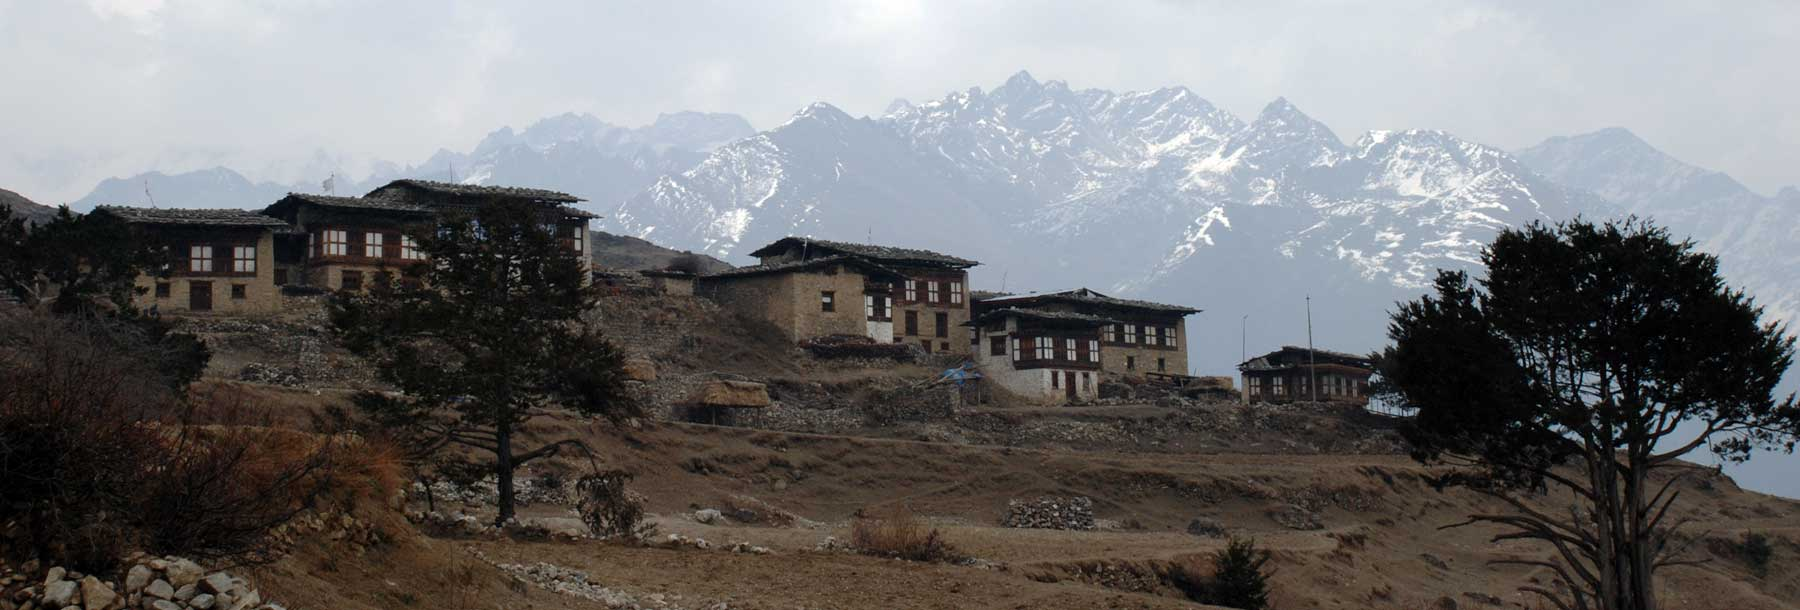 Laya Village, Bhutan